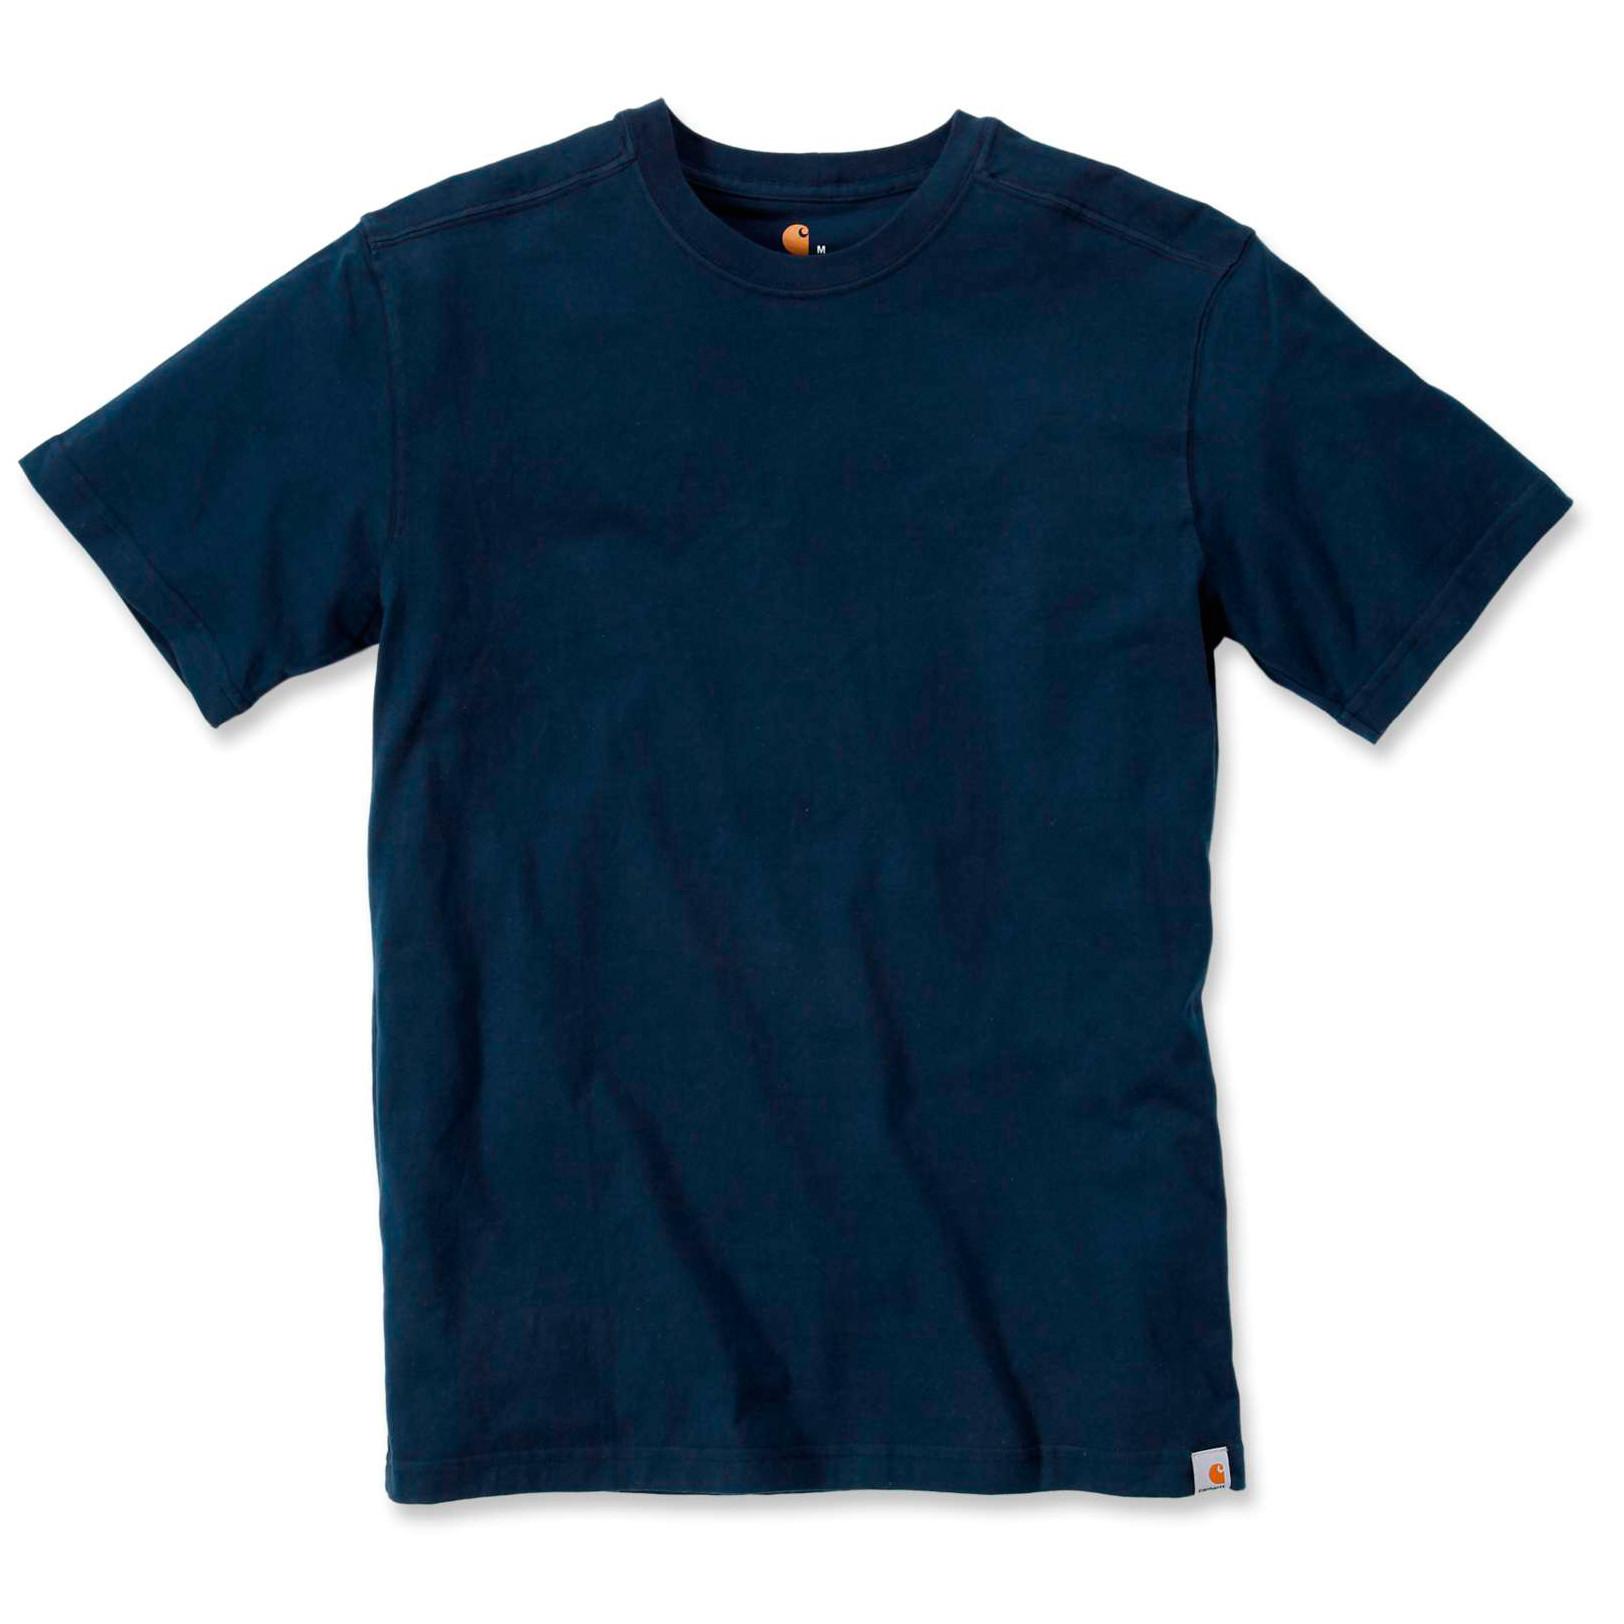 Футболка Carhartt Maddock T-Shirt S/S - 101124 (Navy, M)